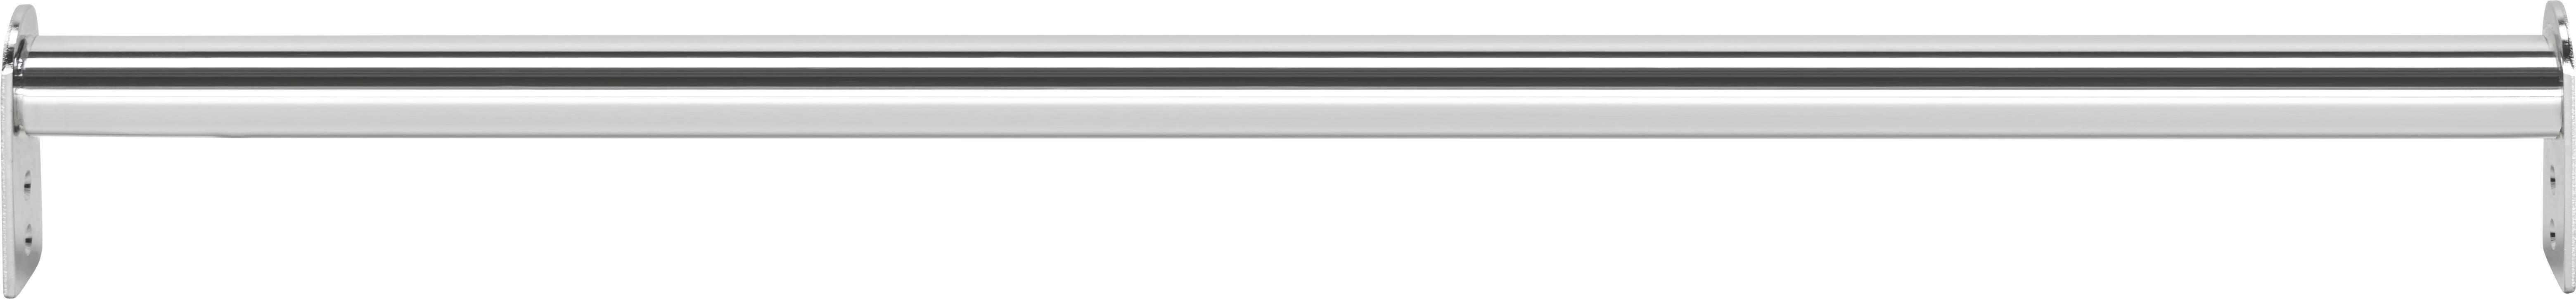 Kleiderstange Chromfarben aus Stahl - Chromfarben, Metall (60-110/7/3cm) - MÖMAX modern living